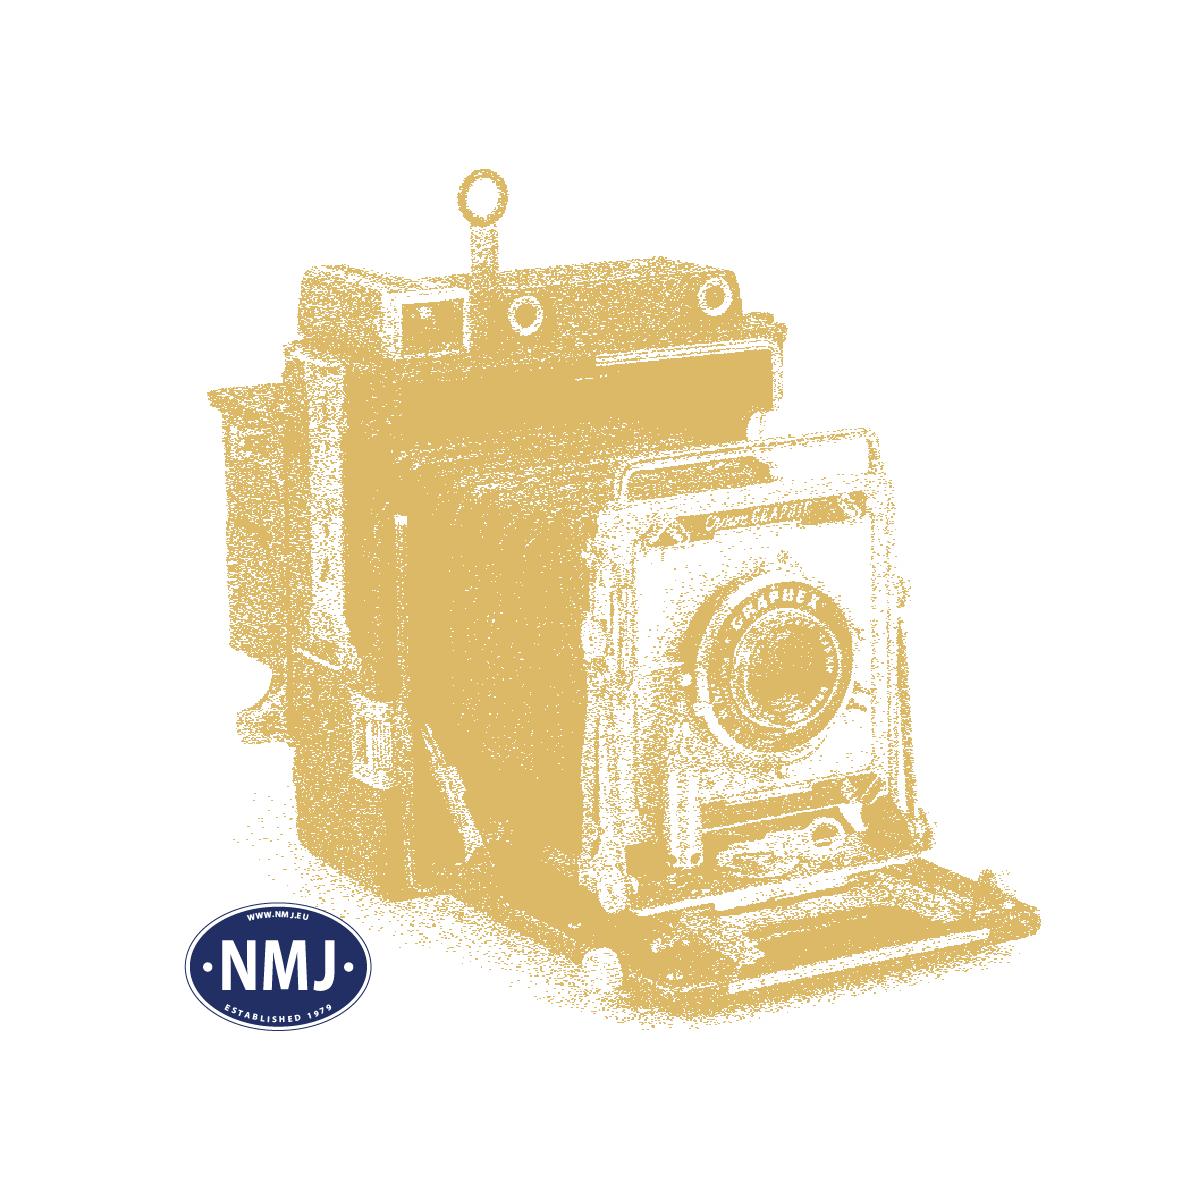 NMJT105.990 - NMJ Topline NSB B3 DCC interiørlyssett m/ 4 hjulaksler